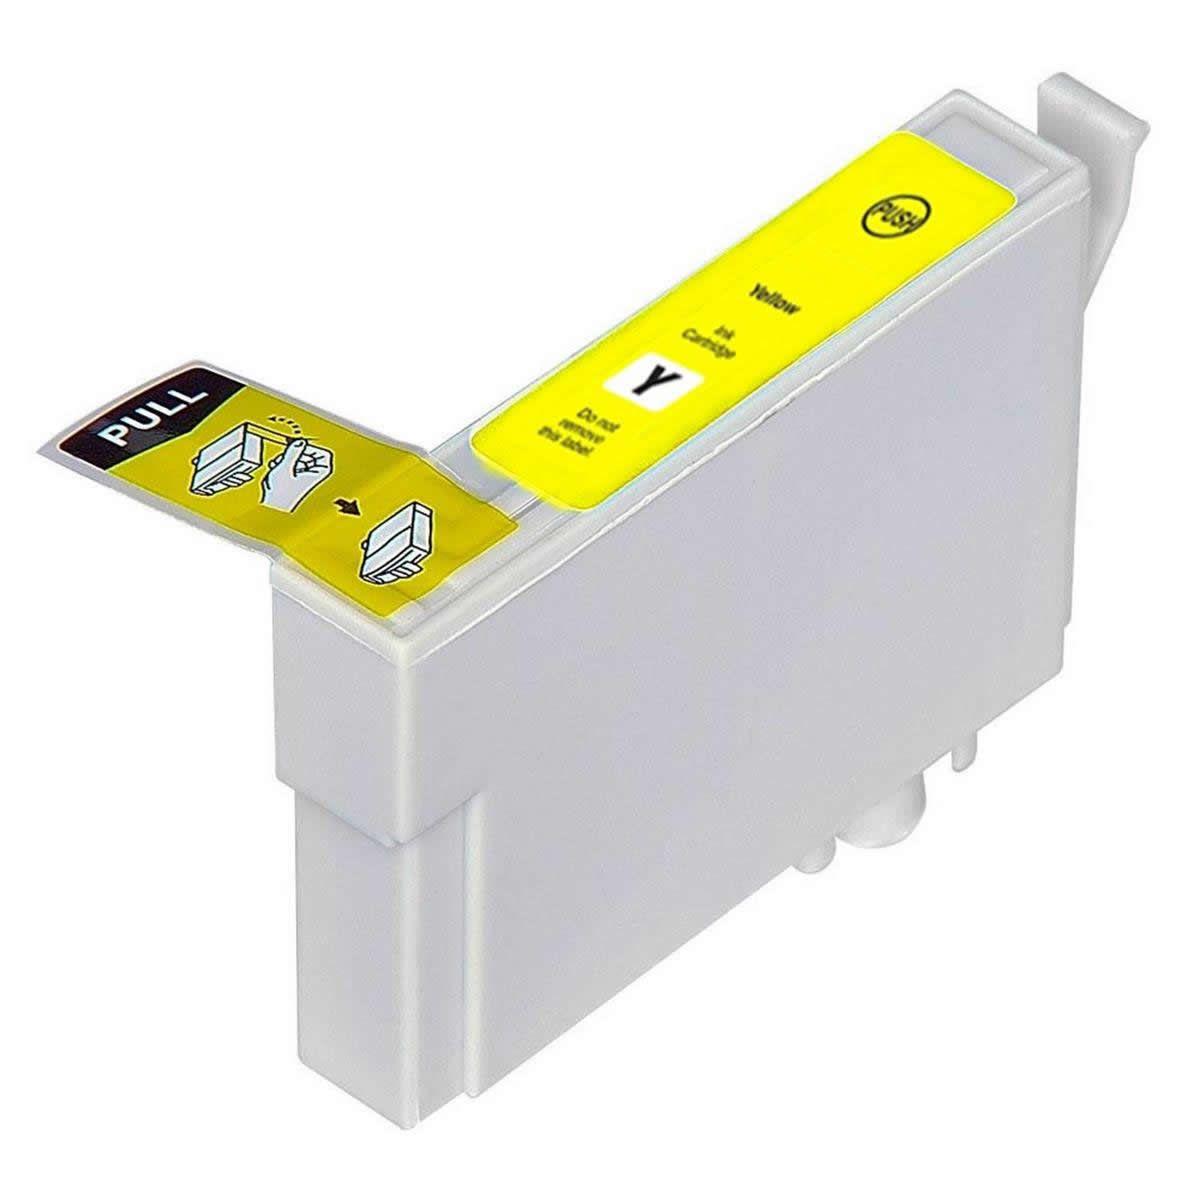 Cartucho TO734N TO73420 734 amarela compatível Epson para C79 CX3900 CX4900 CX5900 TX115